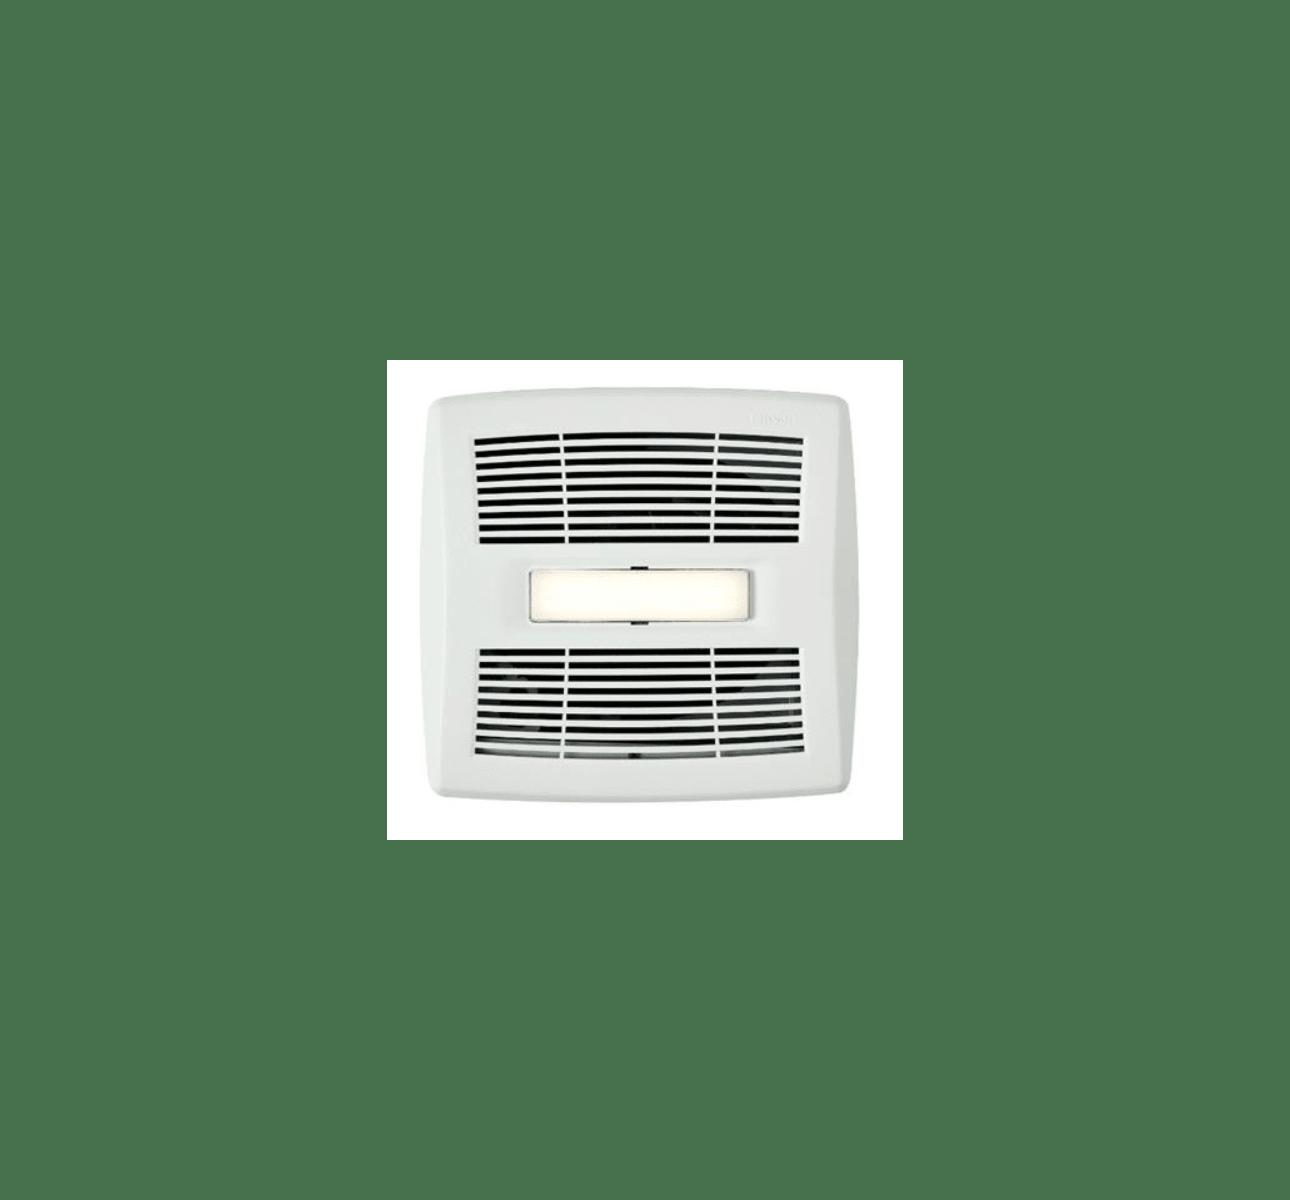 Shop Broan 0 3 Sone 110 Cfm White Bathroom Fan Energy Star: Broan InVent™ Series Bathroom Exhaust Fan With LED Light